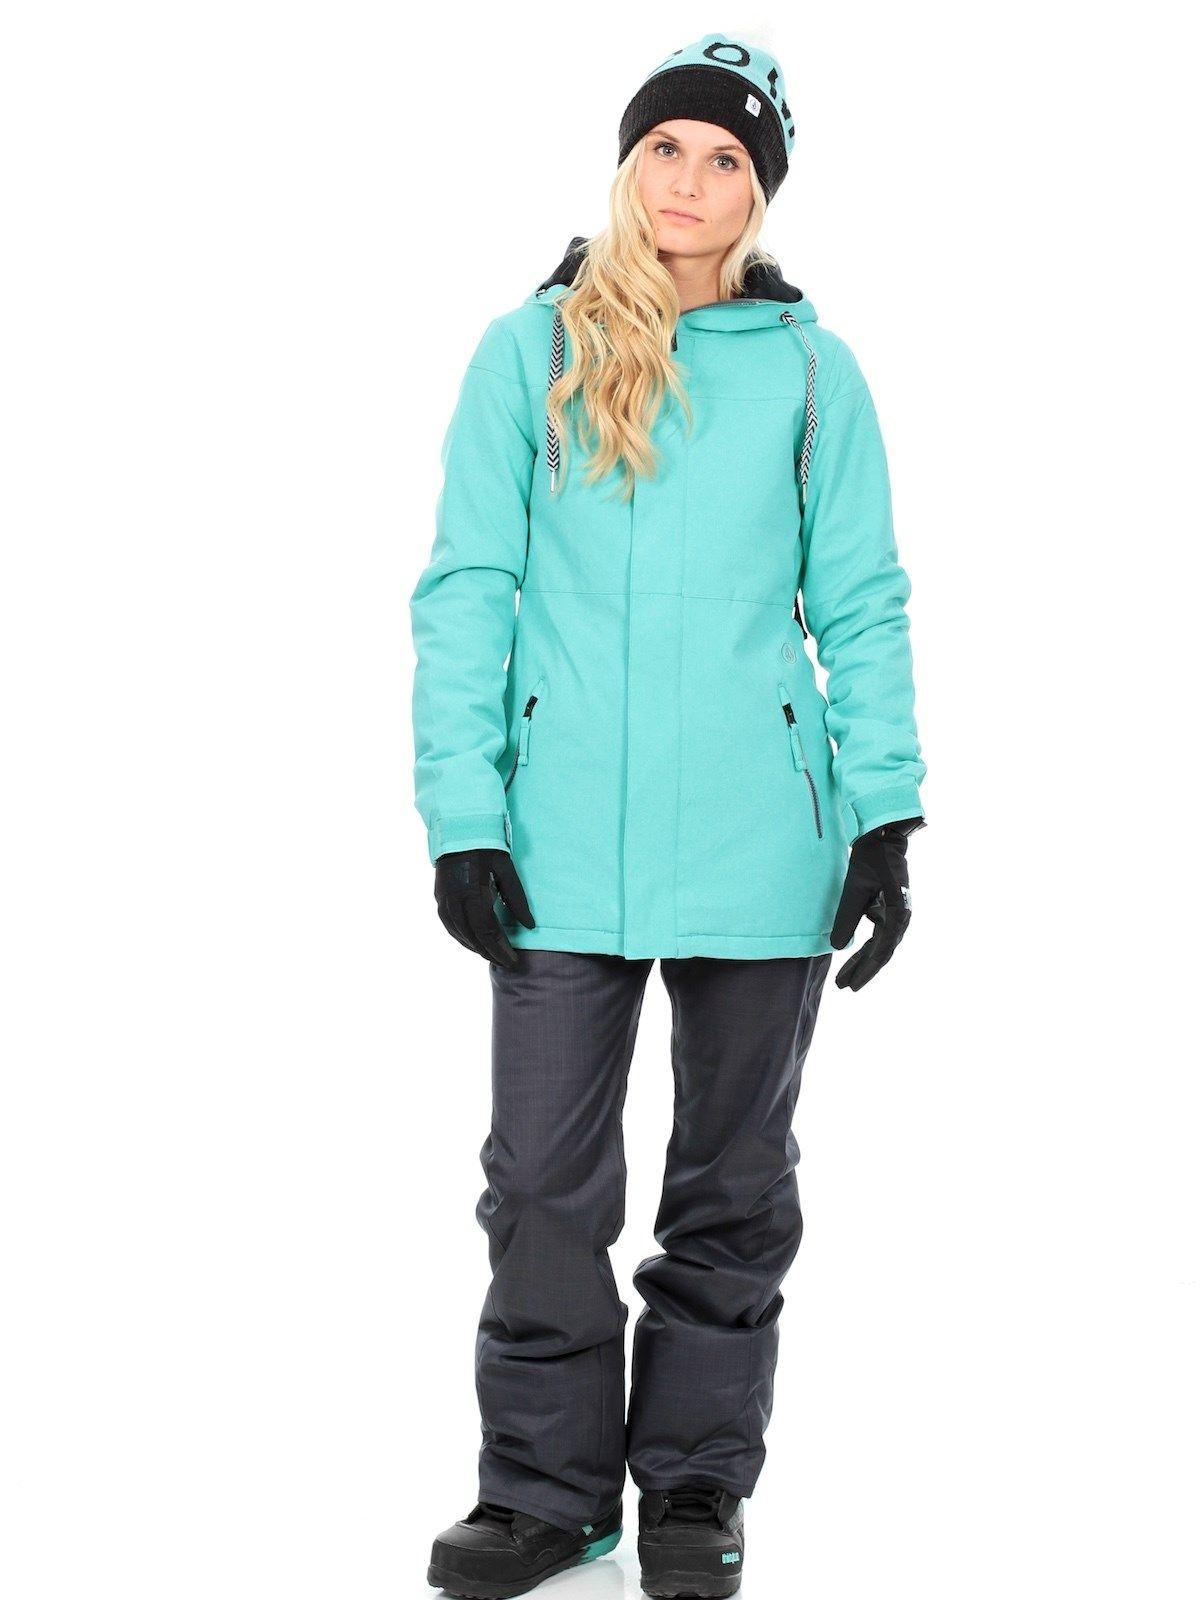 Veste de snowboard femme volcom